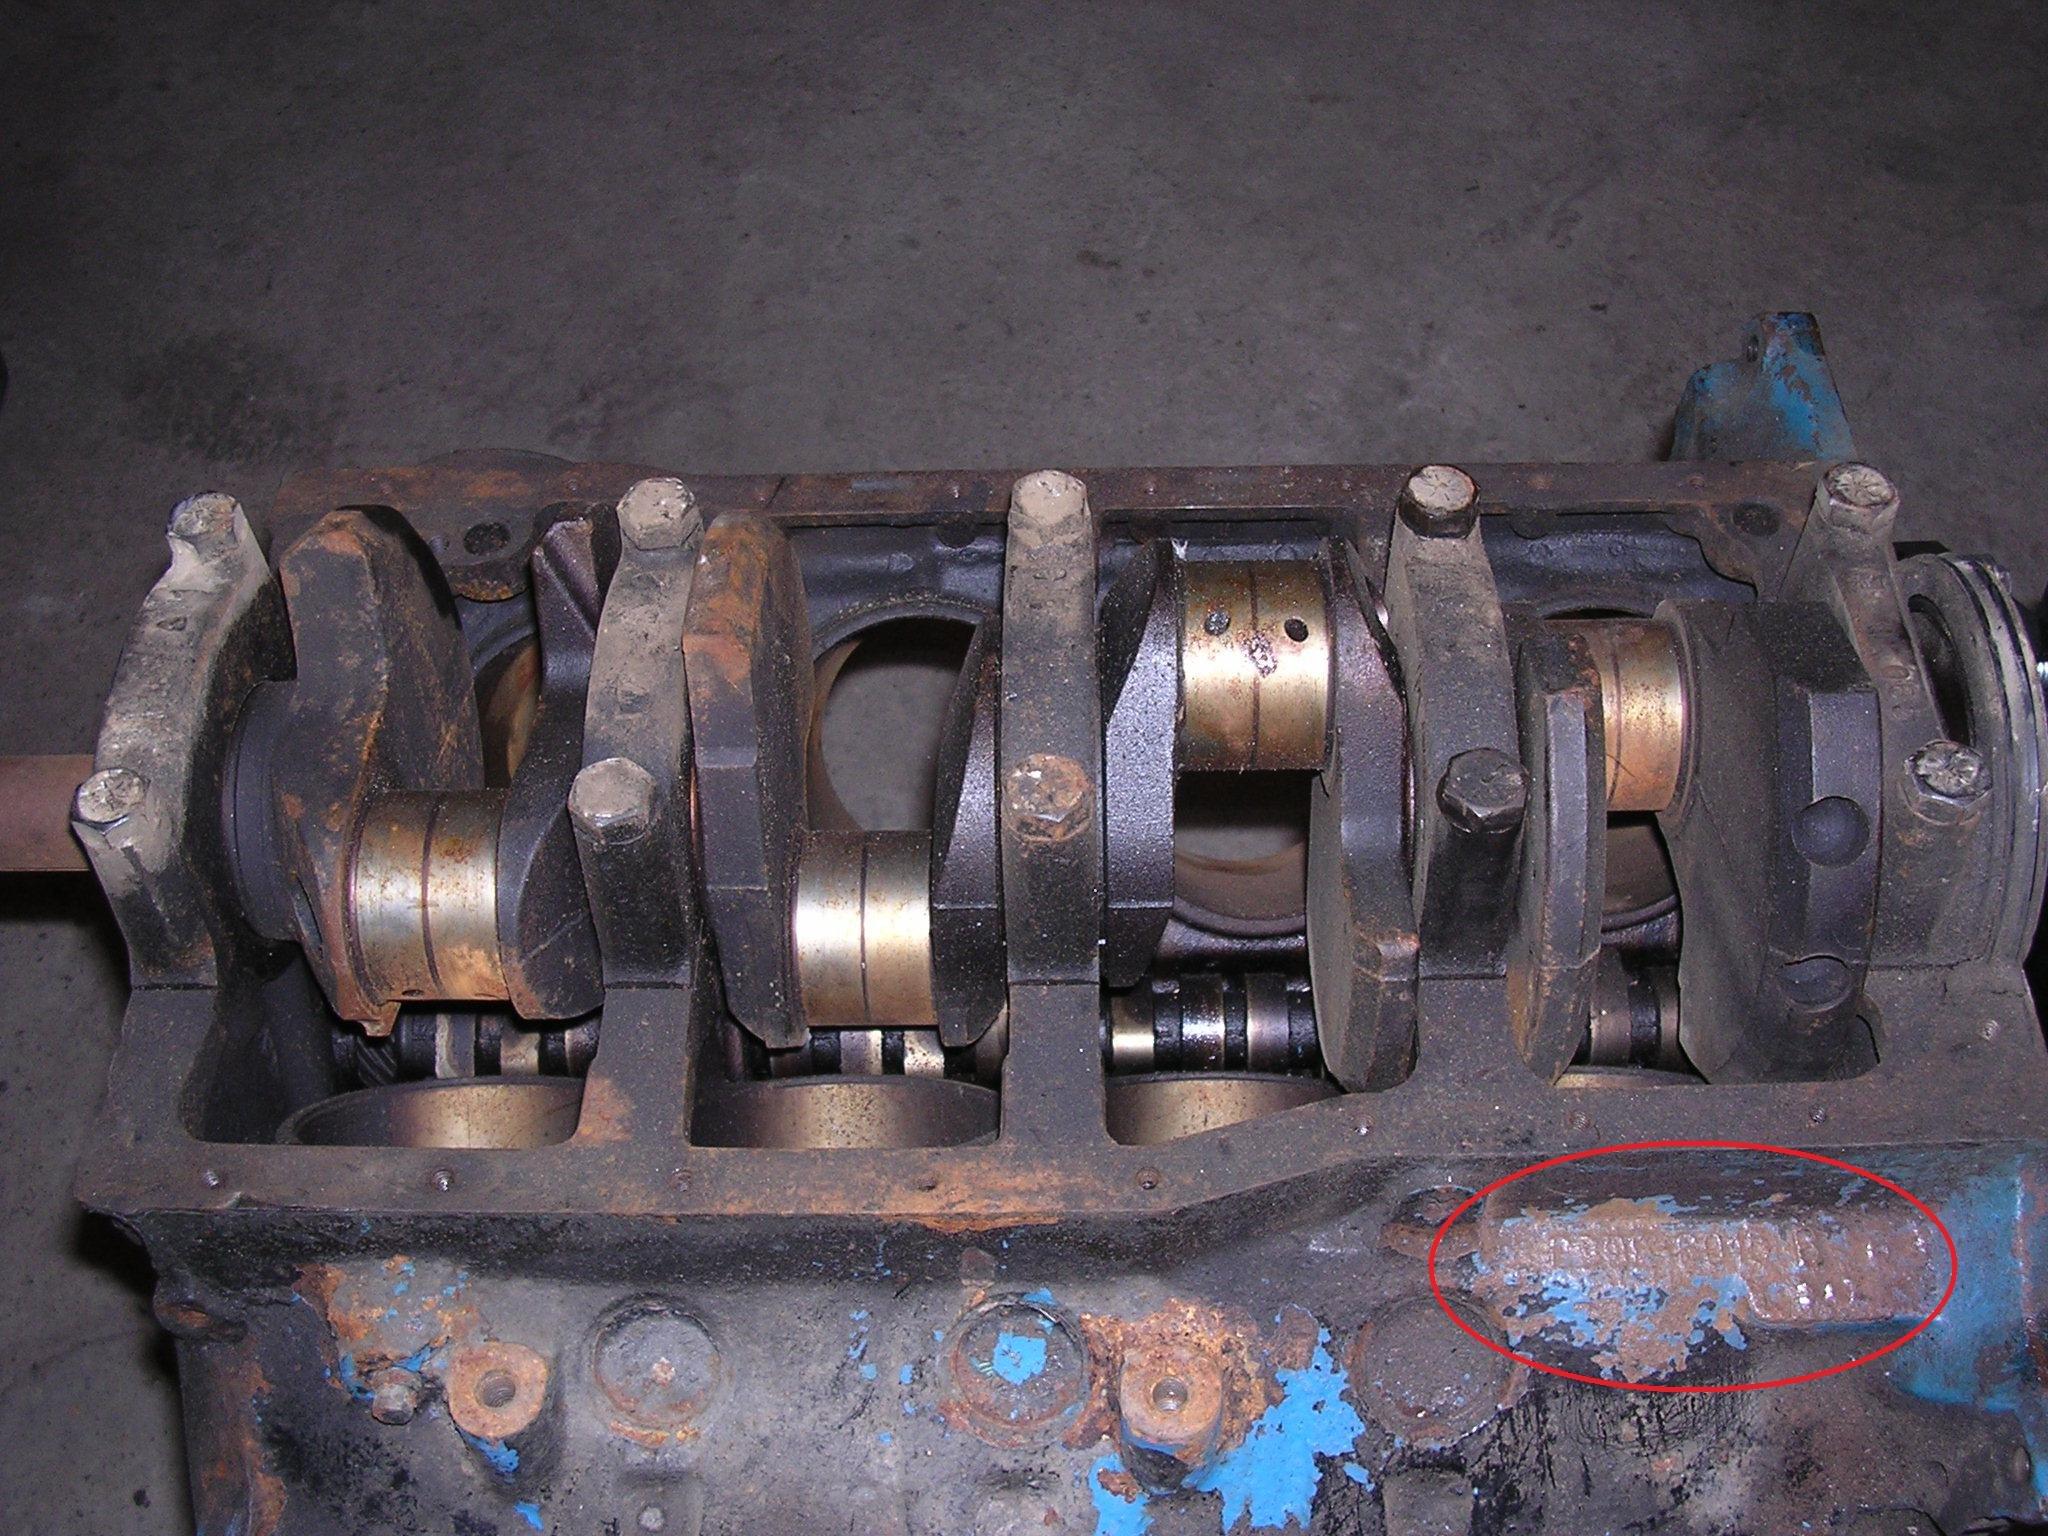 D Engine Block Identification Dscn Mod on Ford Engine Block Serial Number Location